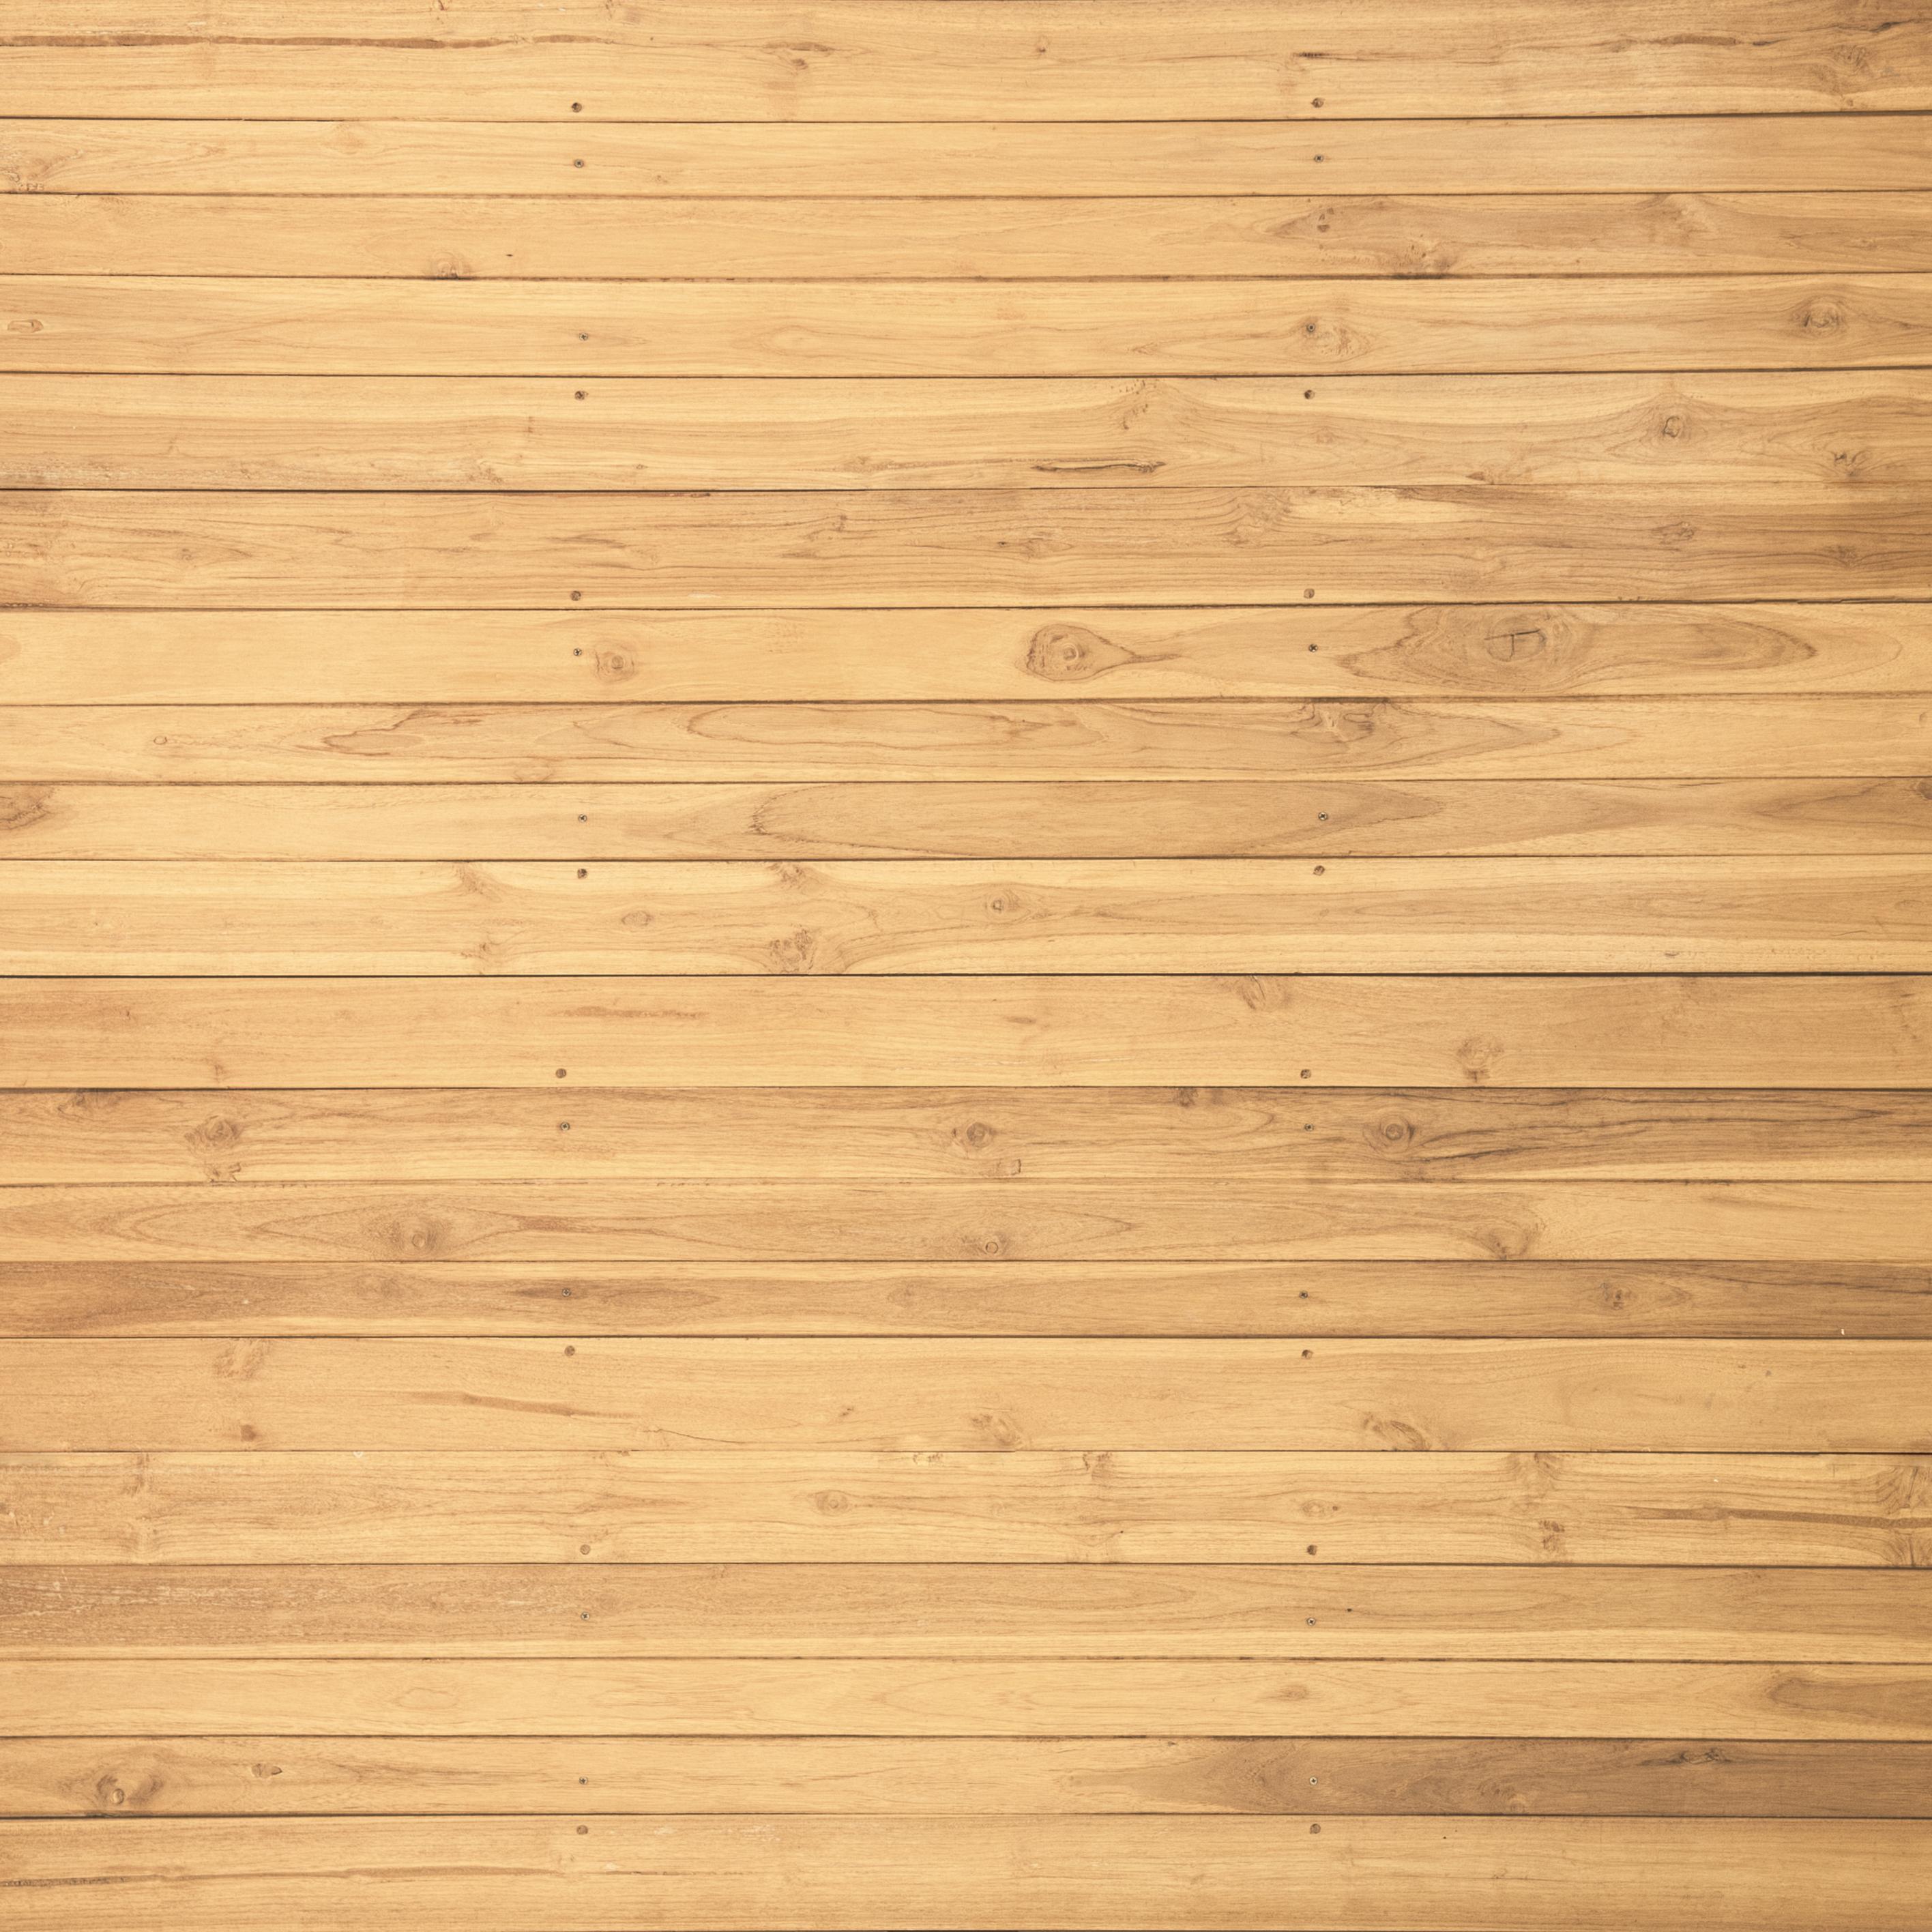 wood floor free stock photo of wood, building, construction, pattern KJKPYXG